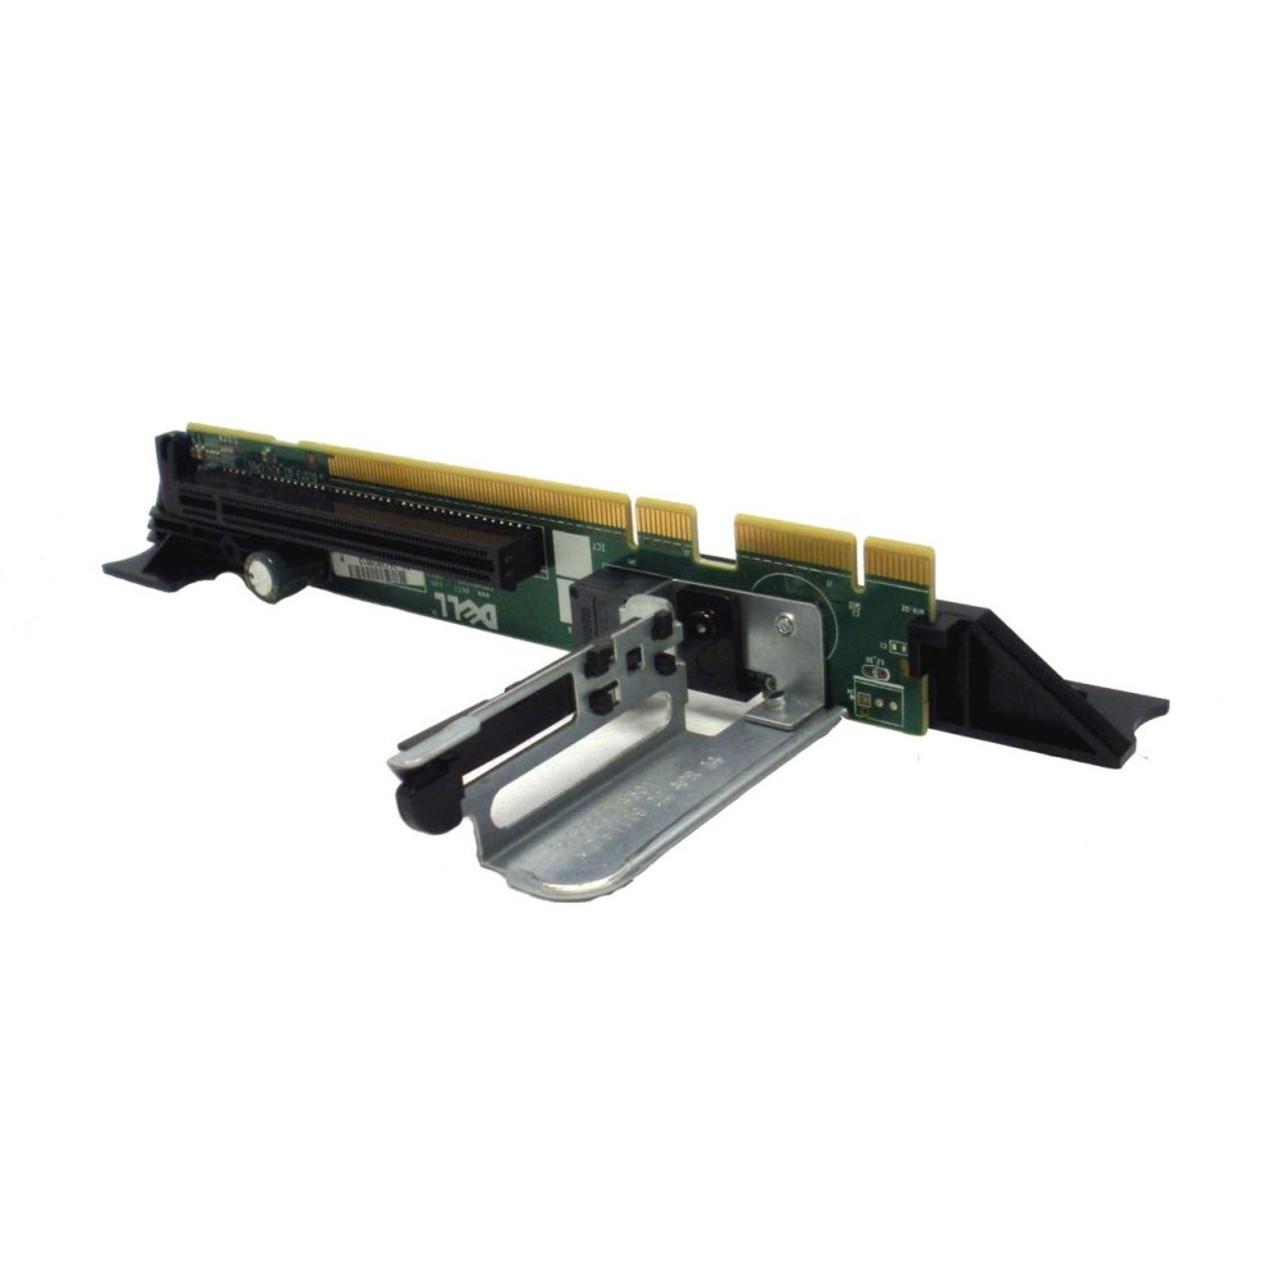 DELL 8TWY5 PowerEdge R620 PCIE #3 Riser Board